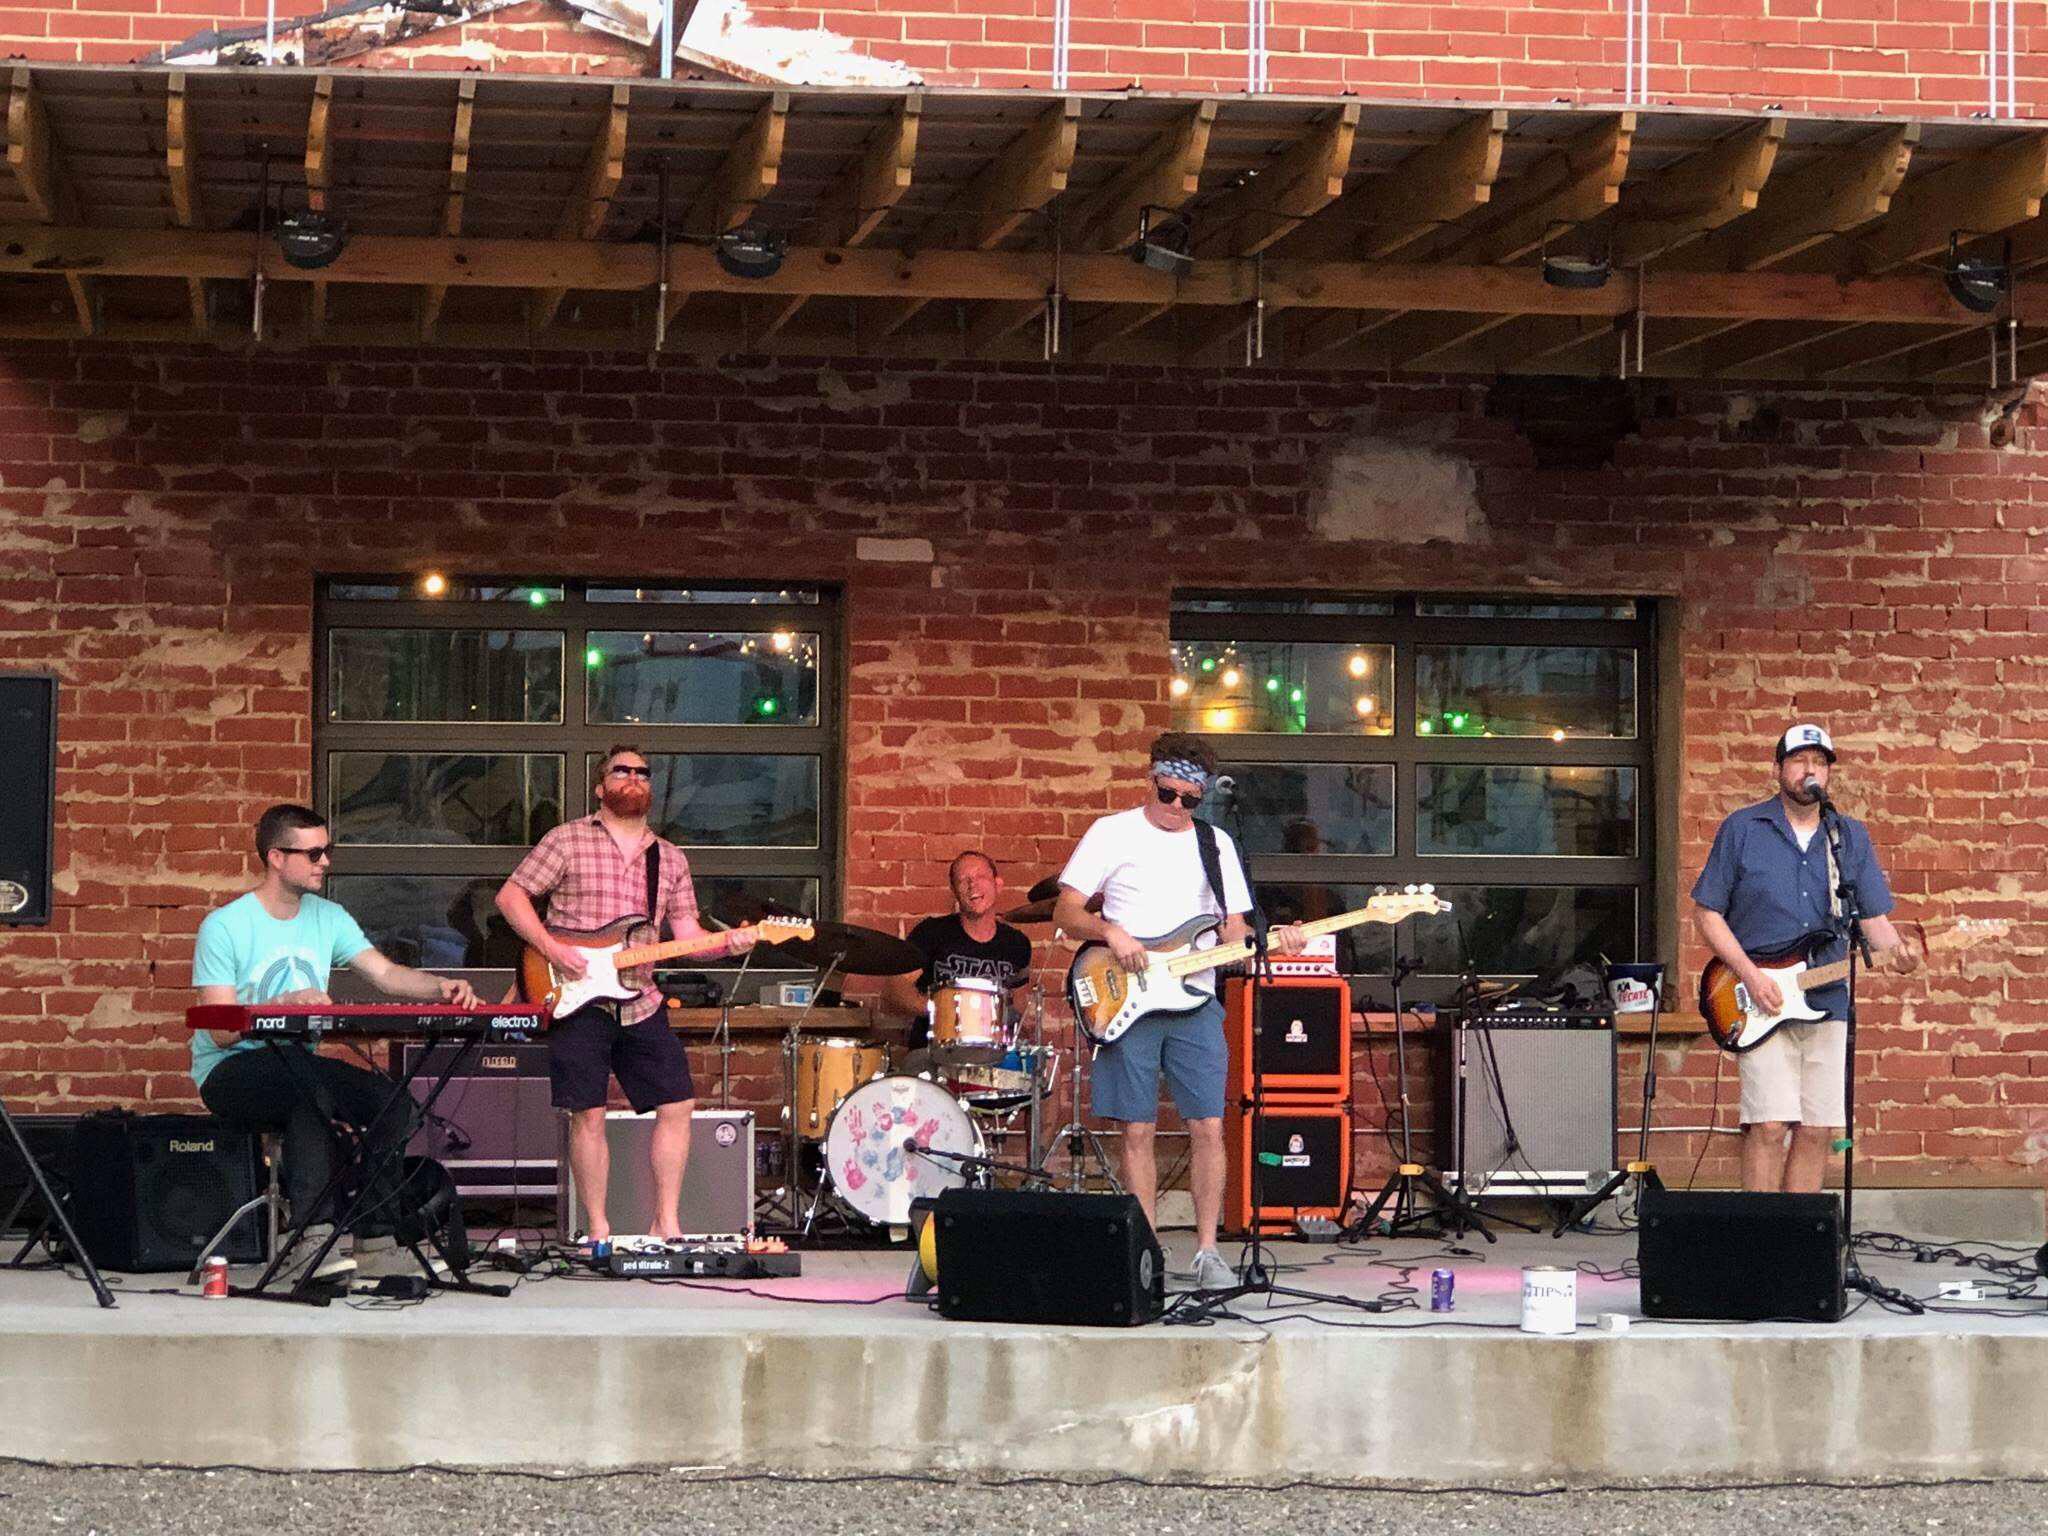 Heywire at The Music Yard @ The Music Yard